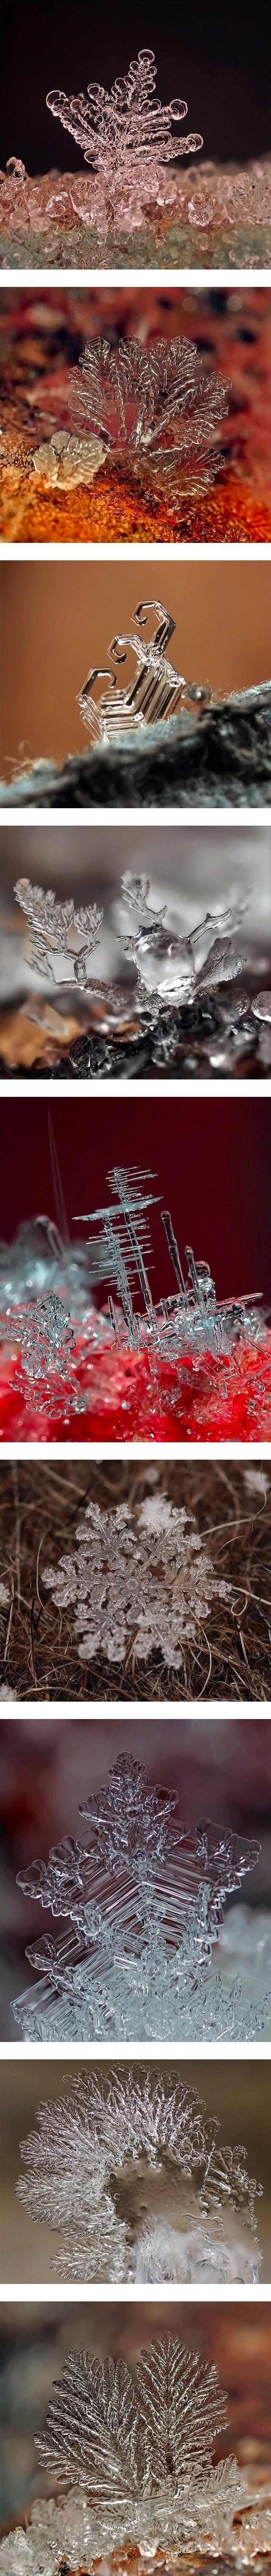 Macro photographs of snowflakes - Andrew Osokin